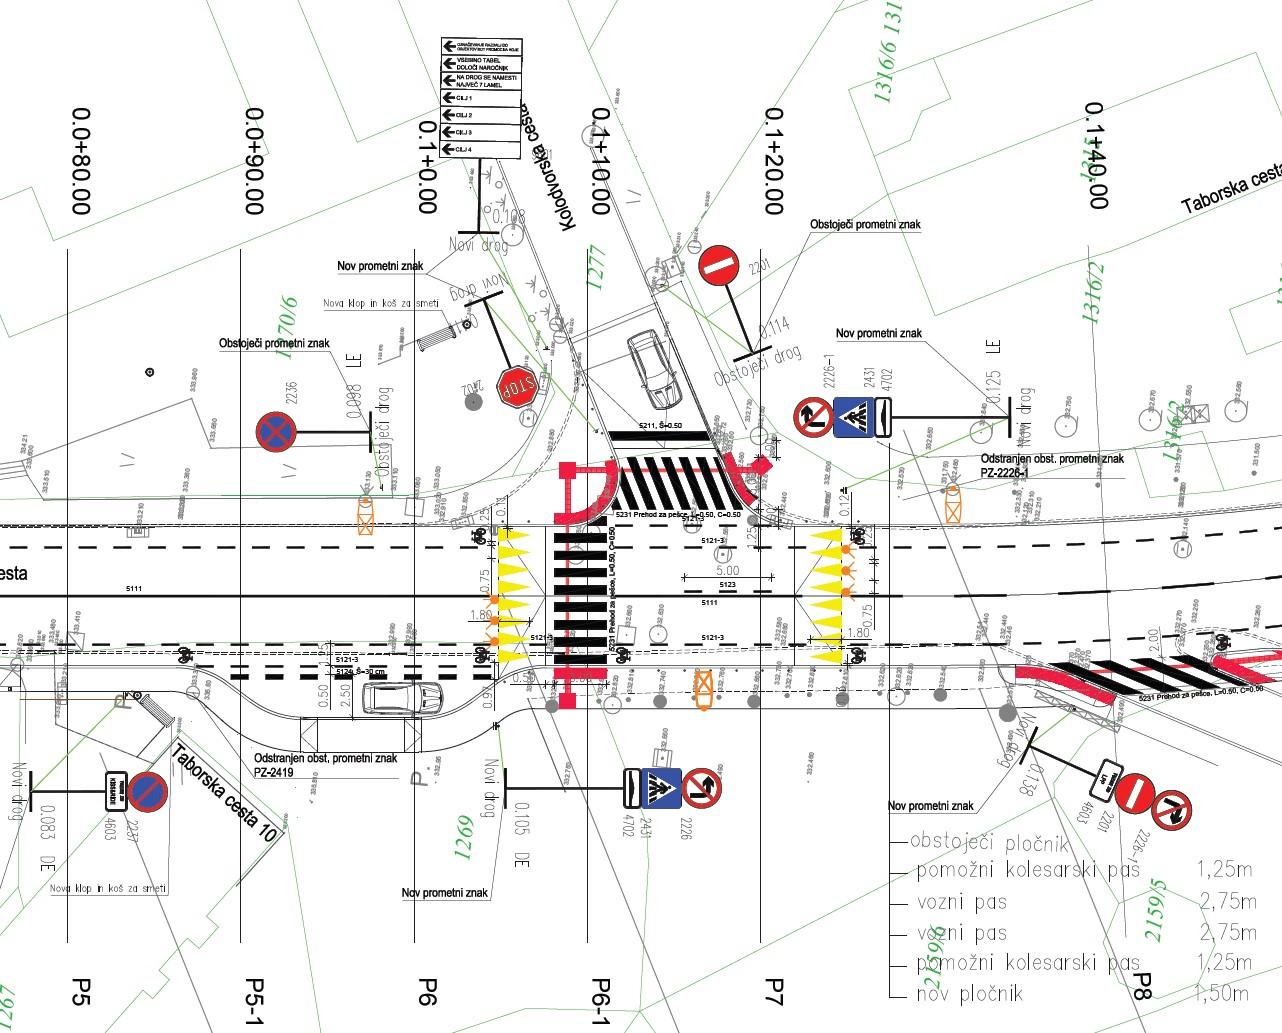 Prometno načrtovanje Taborska cesta Grosuplje slika5